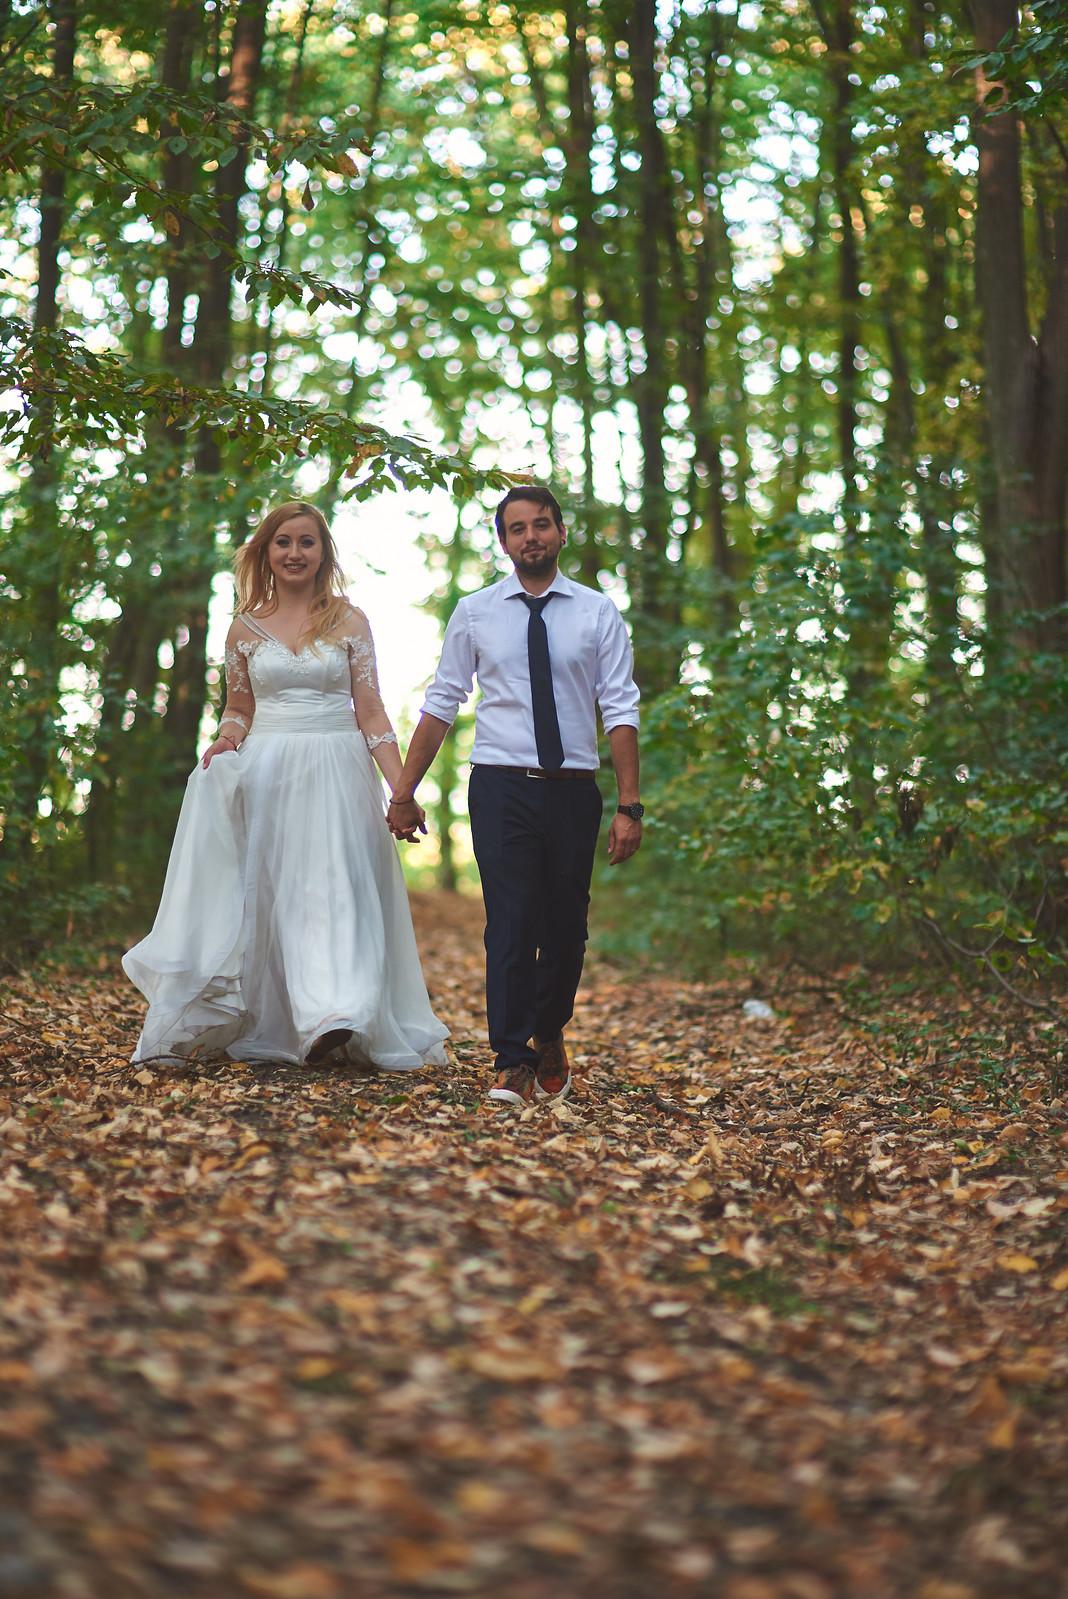 wedding photography, after wedding photo session, comana park photos, bucharest wedding photographer, epspictures